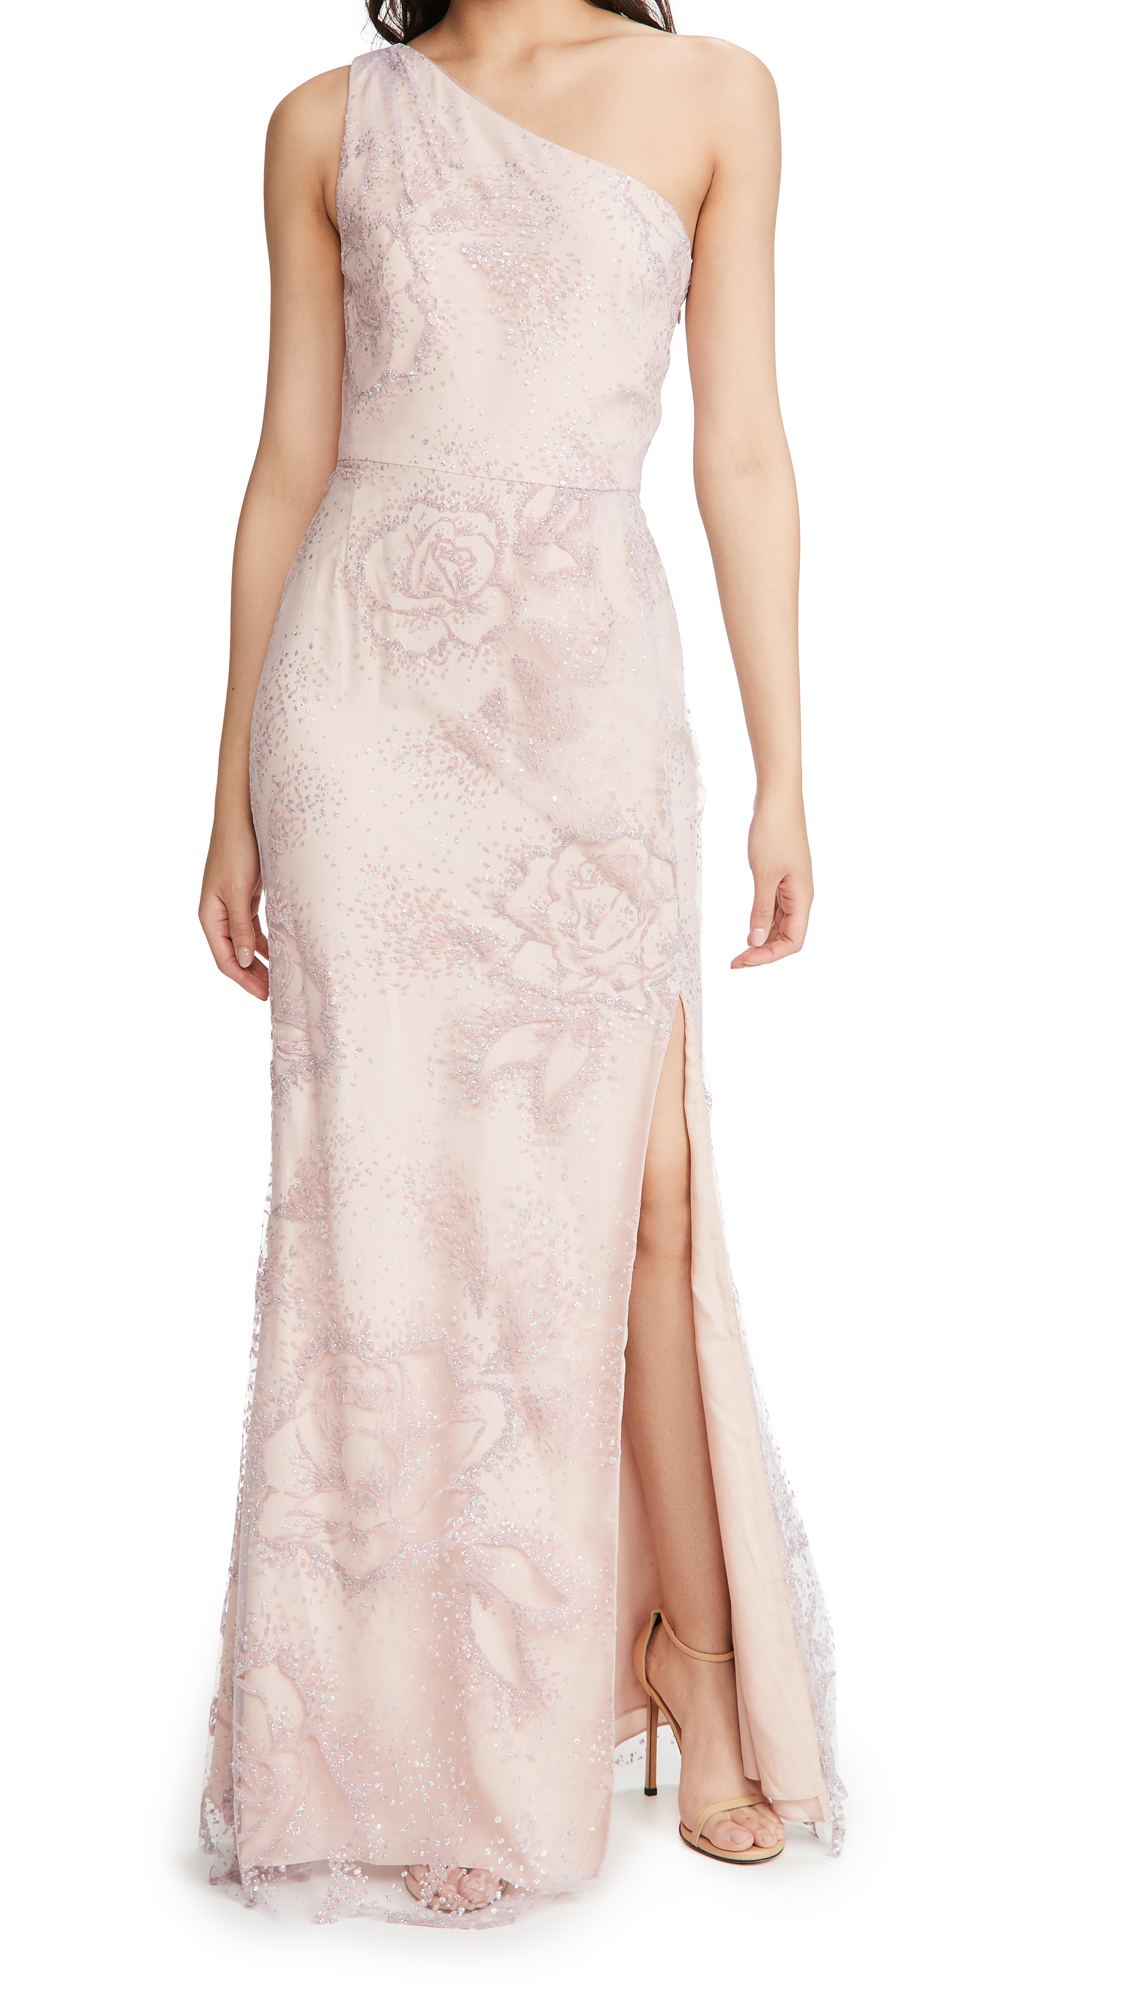 Marchesa Notte One Shoulder Flocked Glitter Tulle Gown